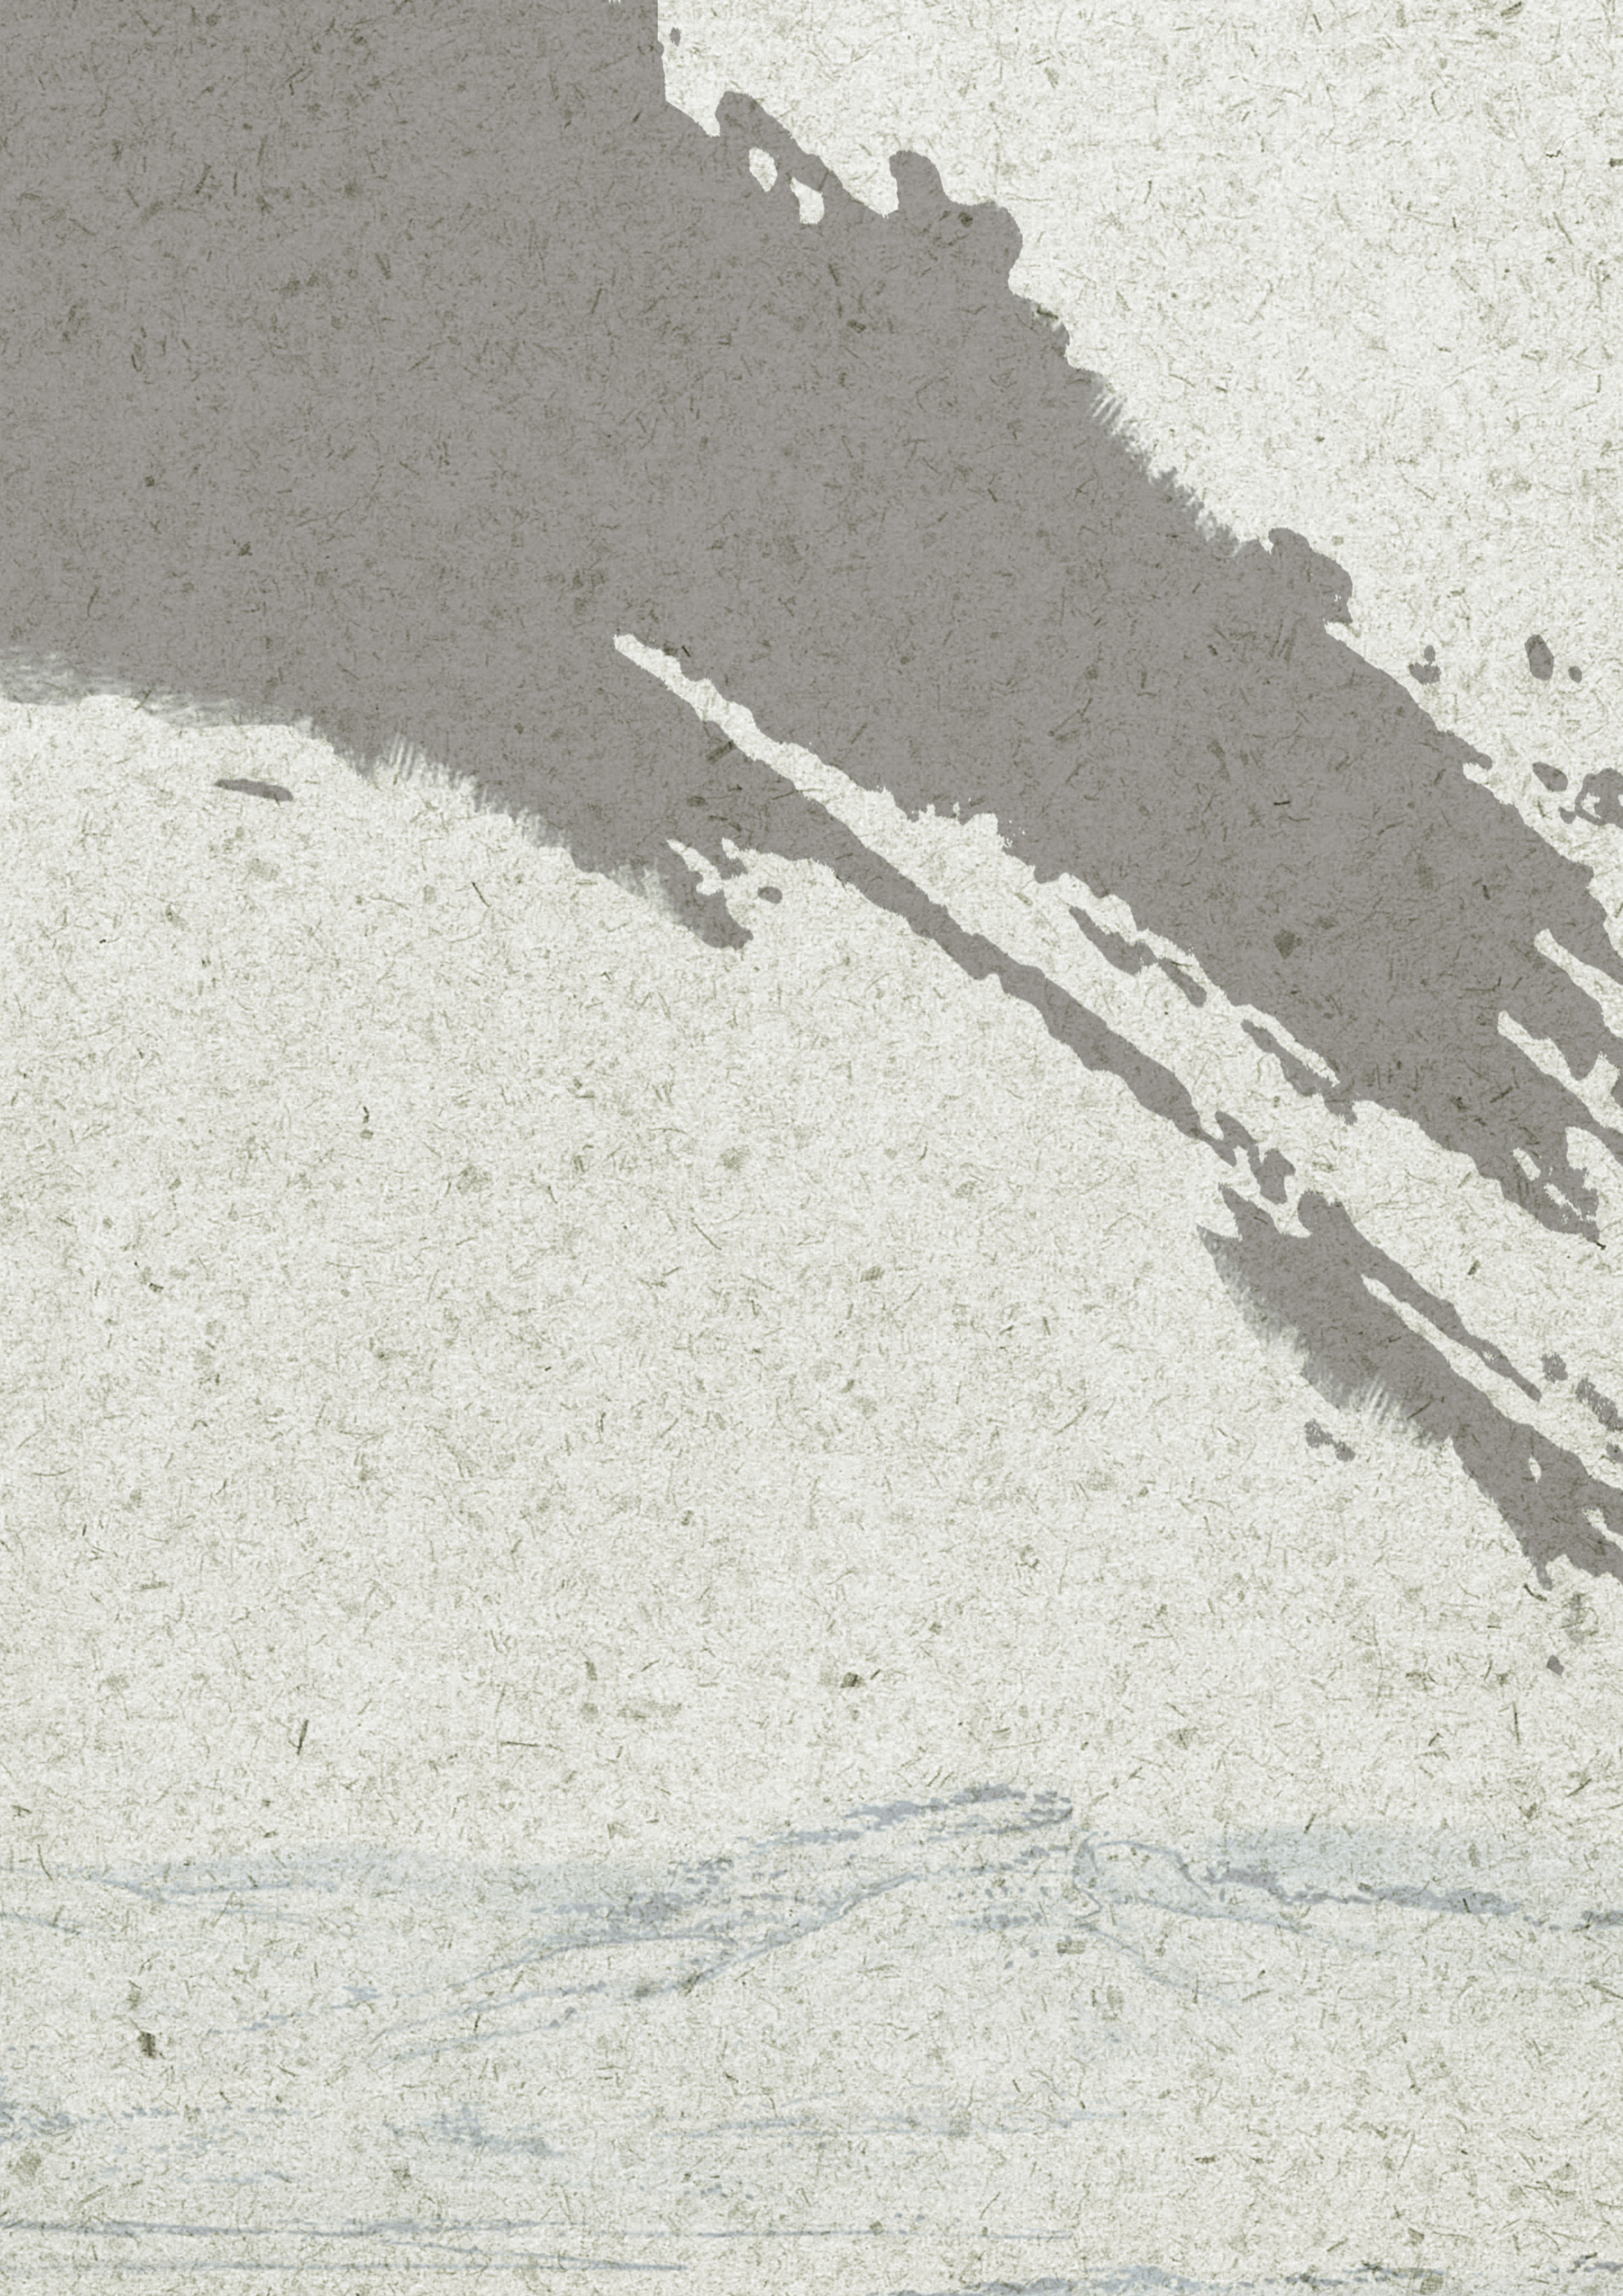 grey ink art flyers background  flyer  ink  jiangnan